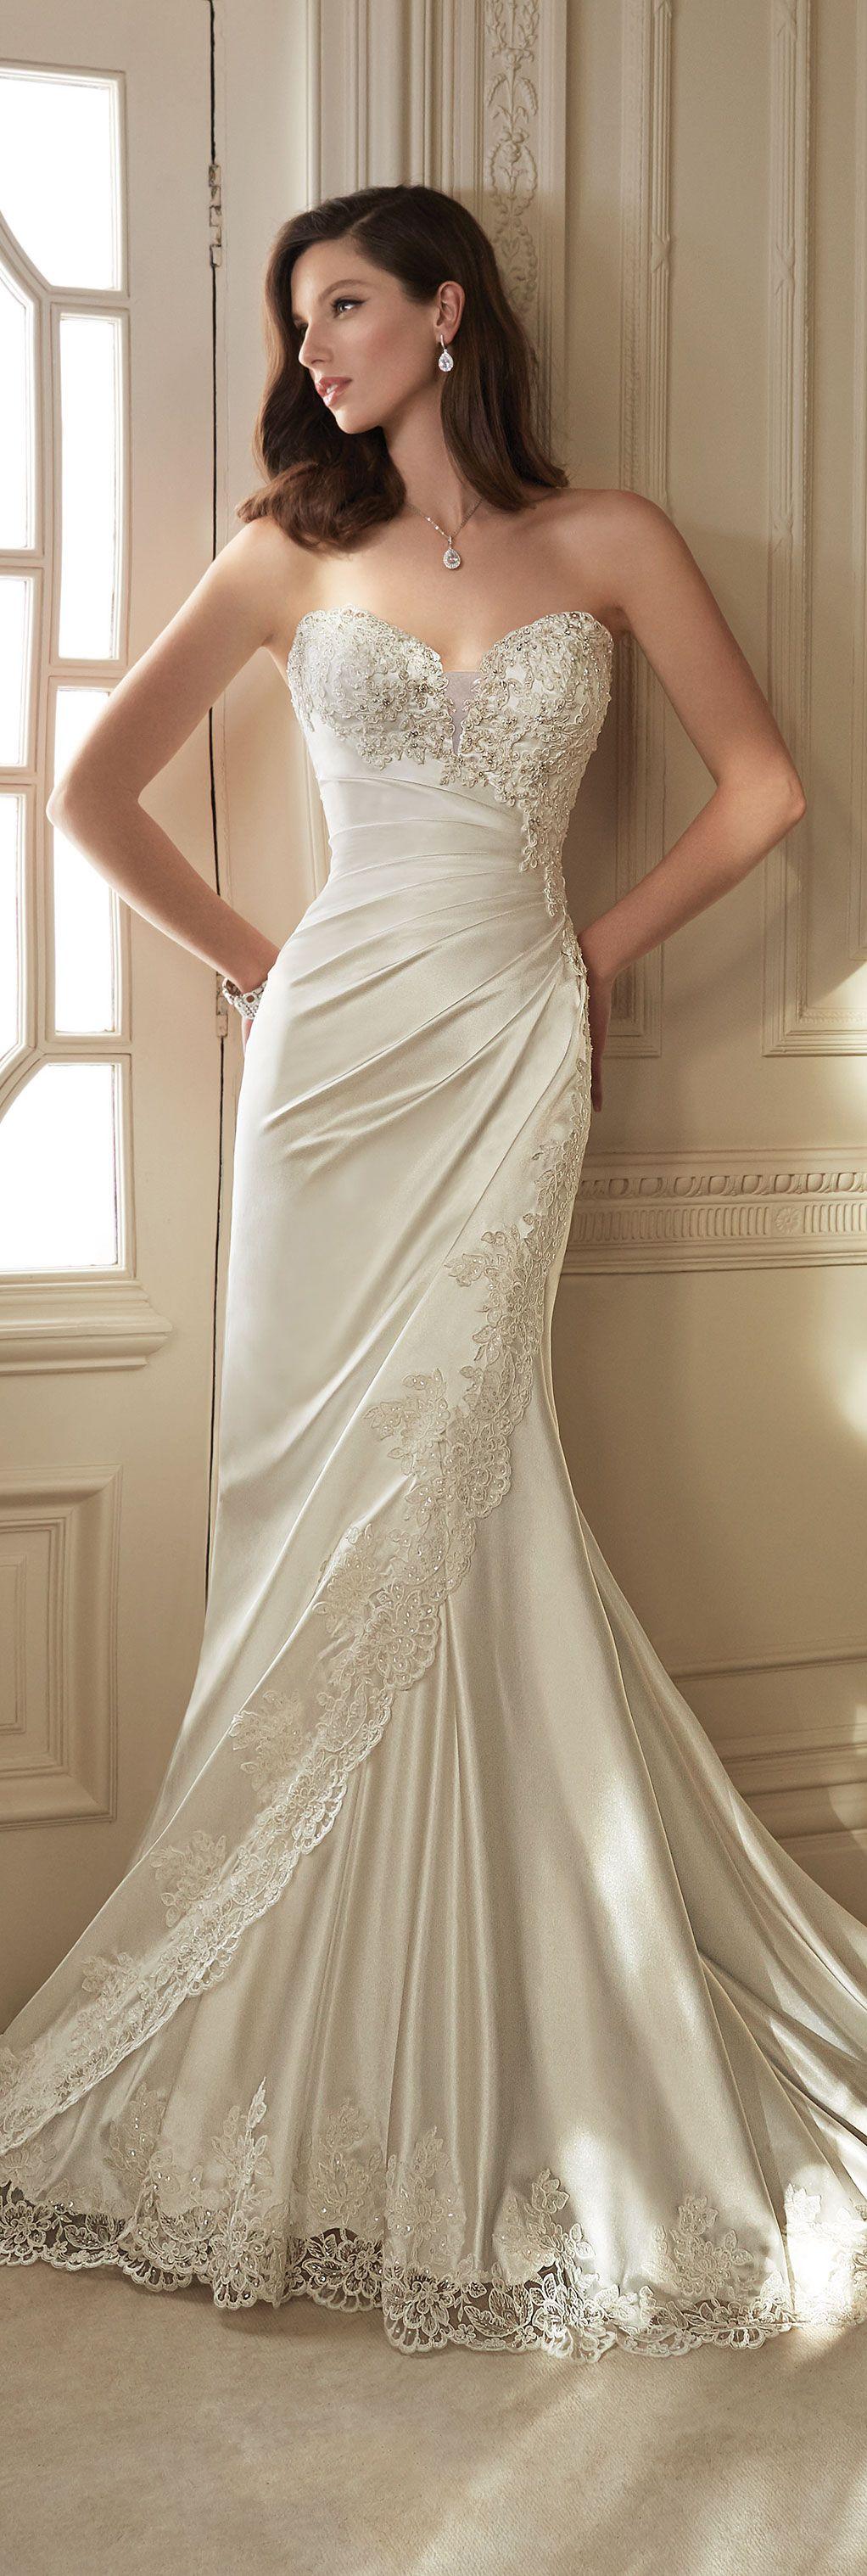 Sophia Tolli Wedding Dresses 2019 for Mon Cheri – Bridal Gowns